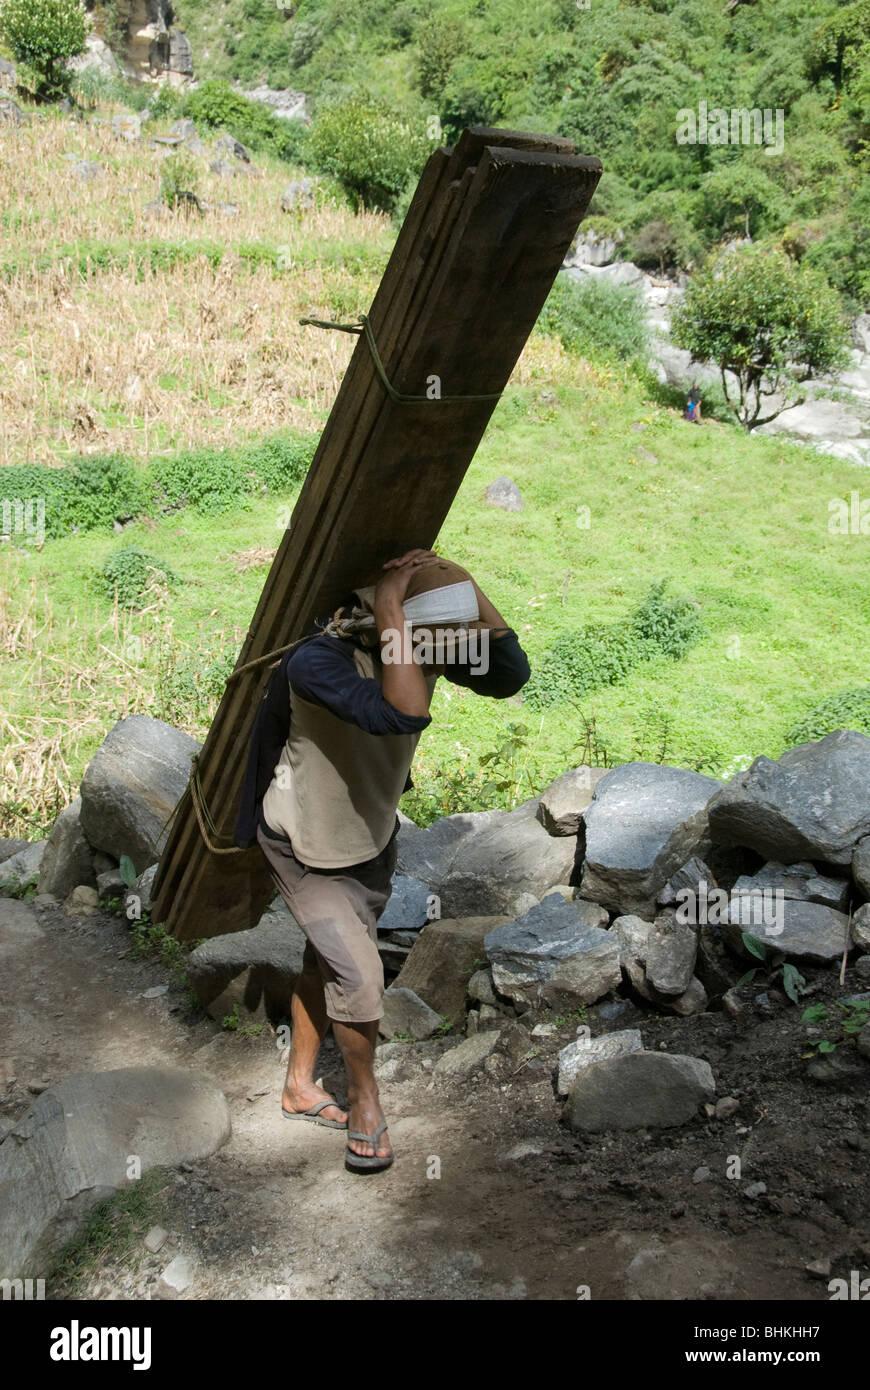 Porter carrying heavy loads, Annapurna Circuit, Karte, Nepal - Stock Image